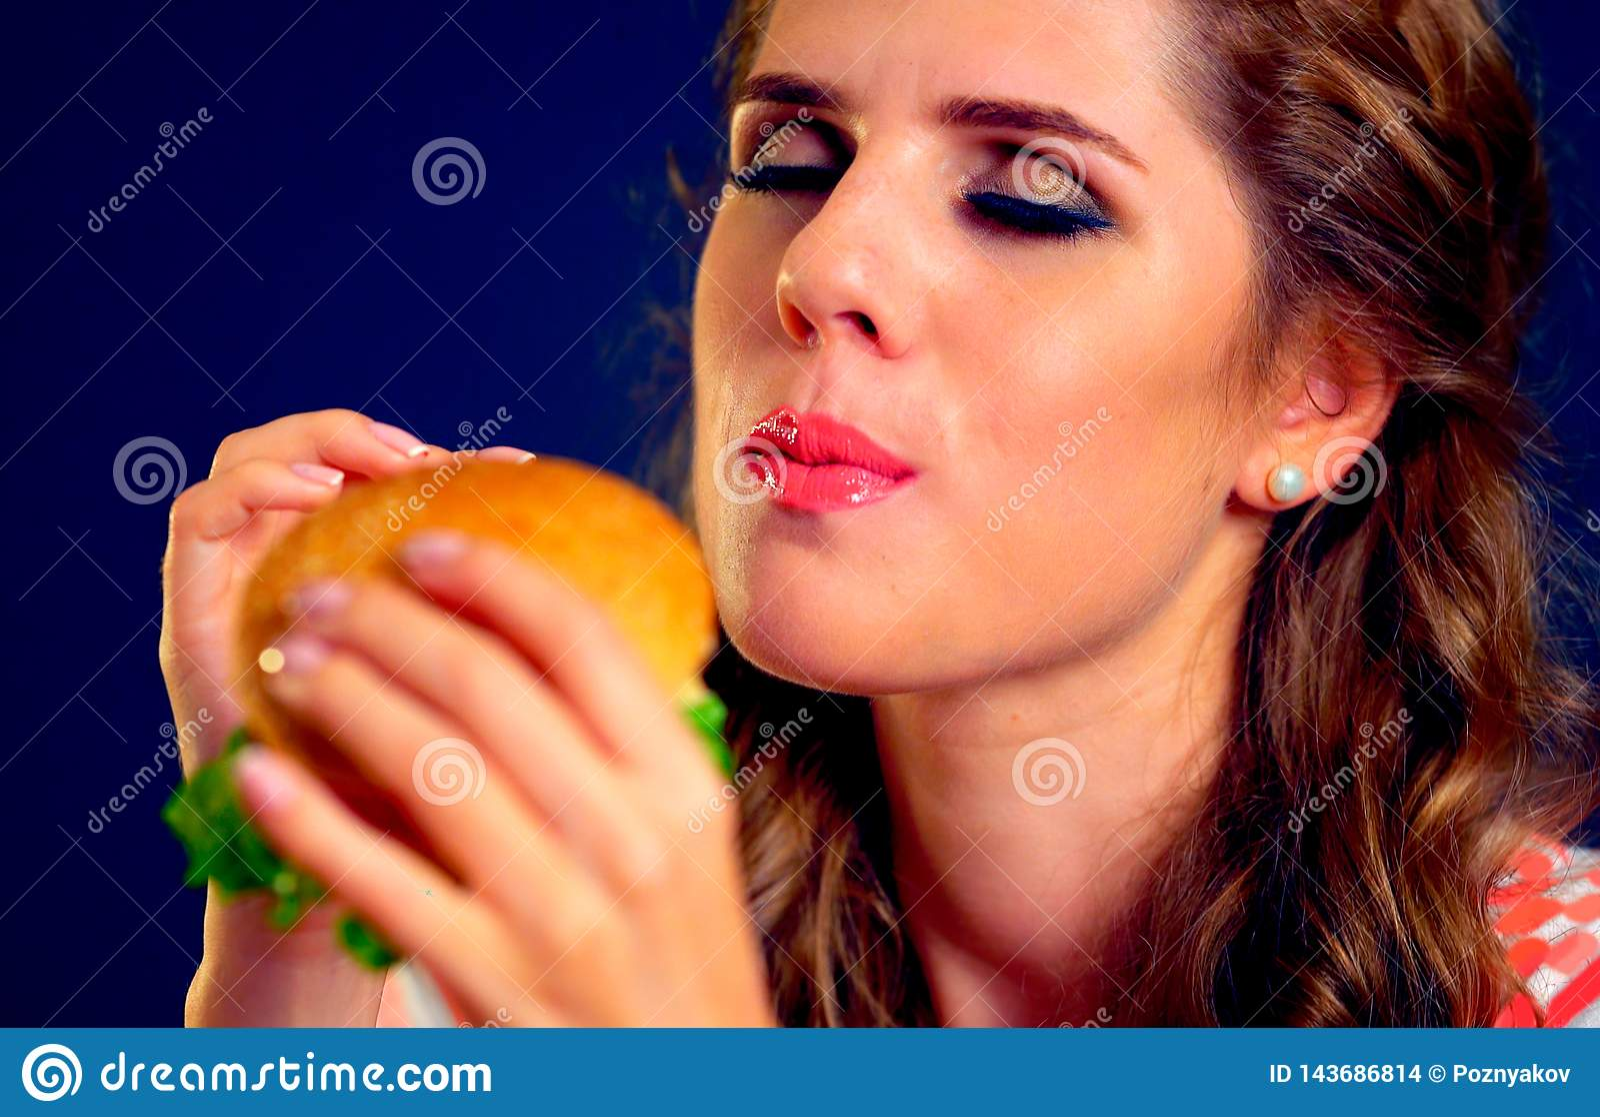 Woman edacity eat hamburger fast food